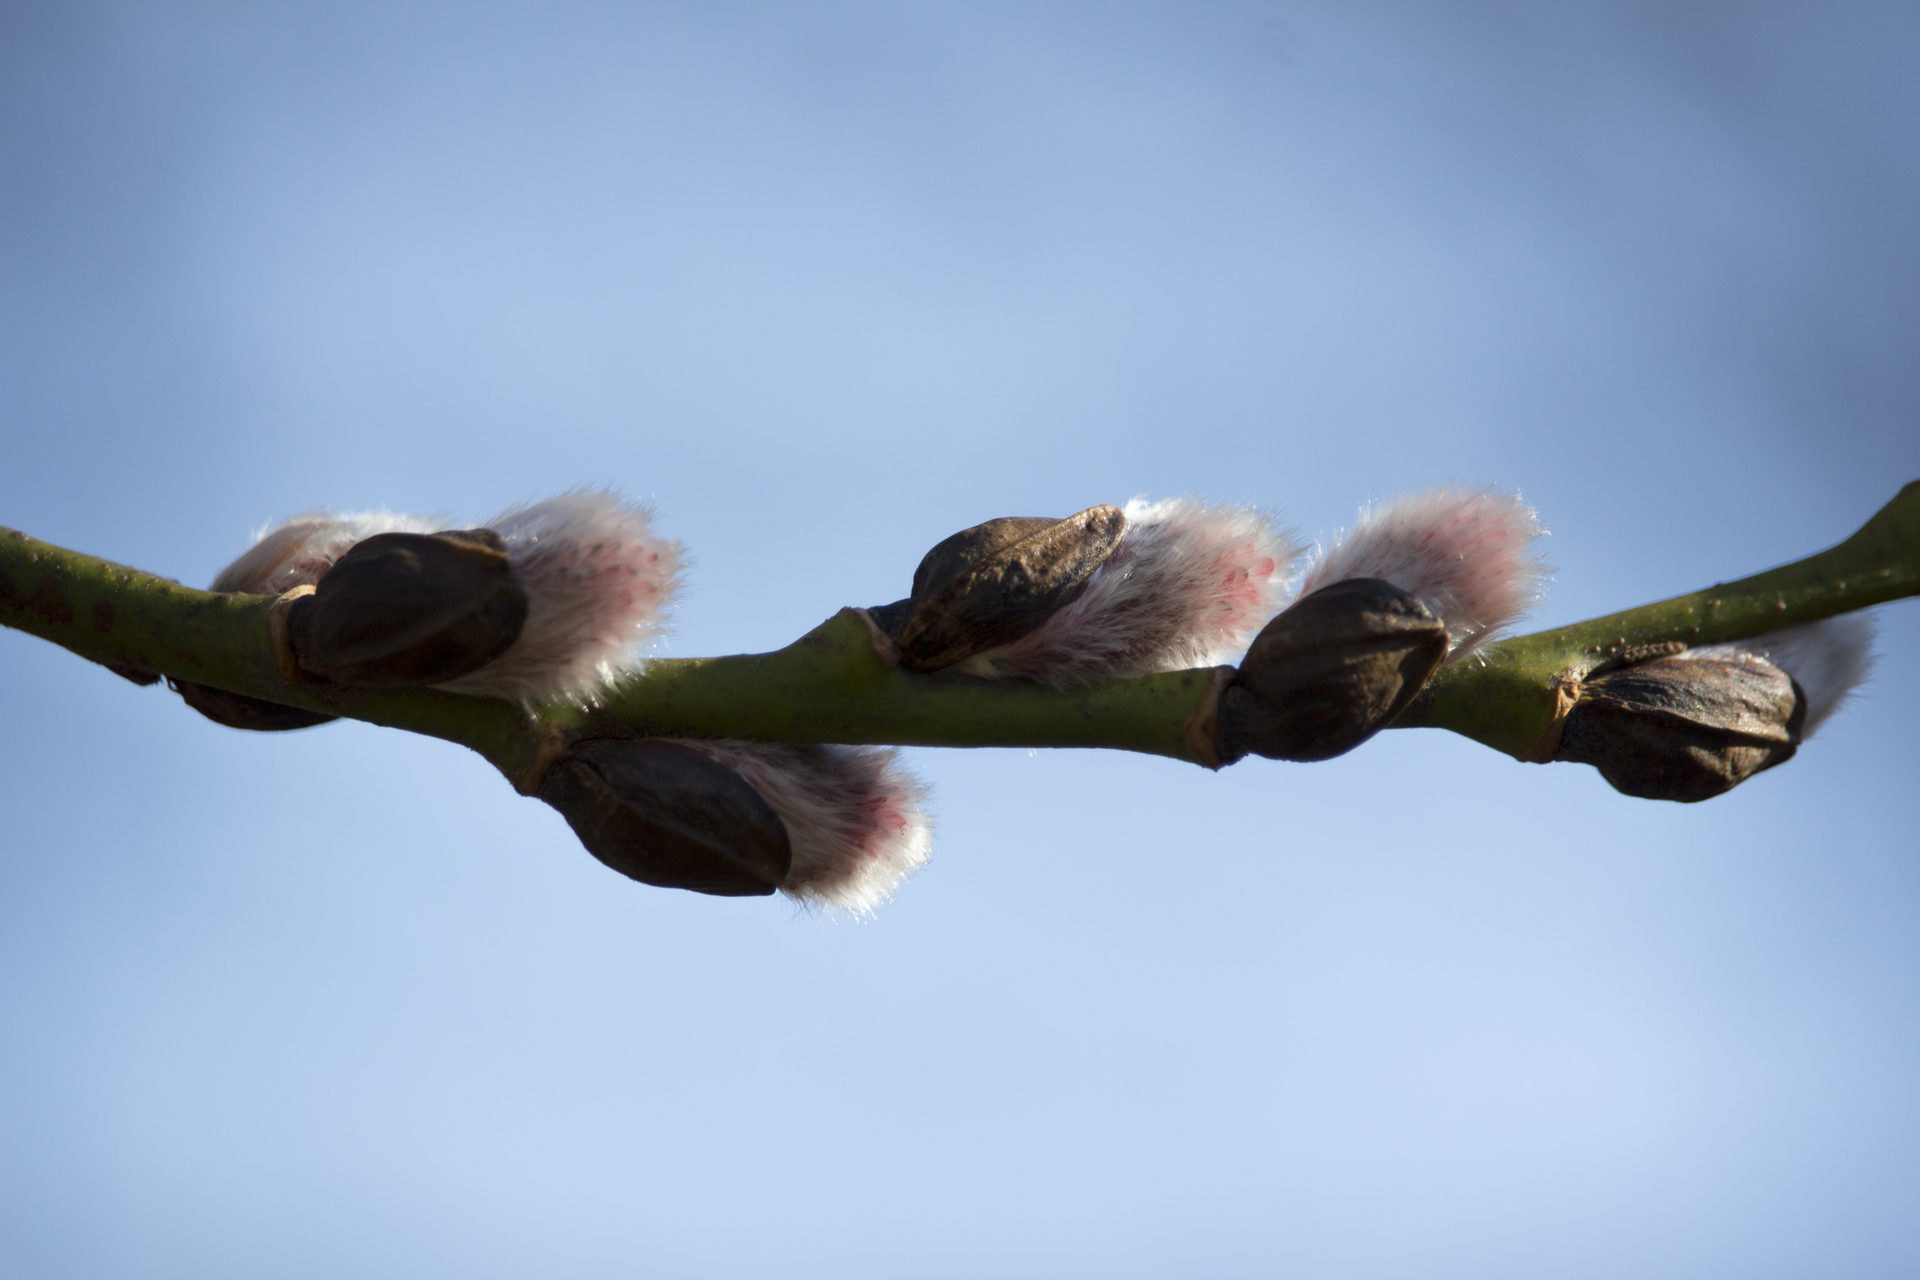 Spring - branch willow twig -  Vår - videkvist gren